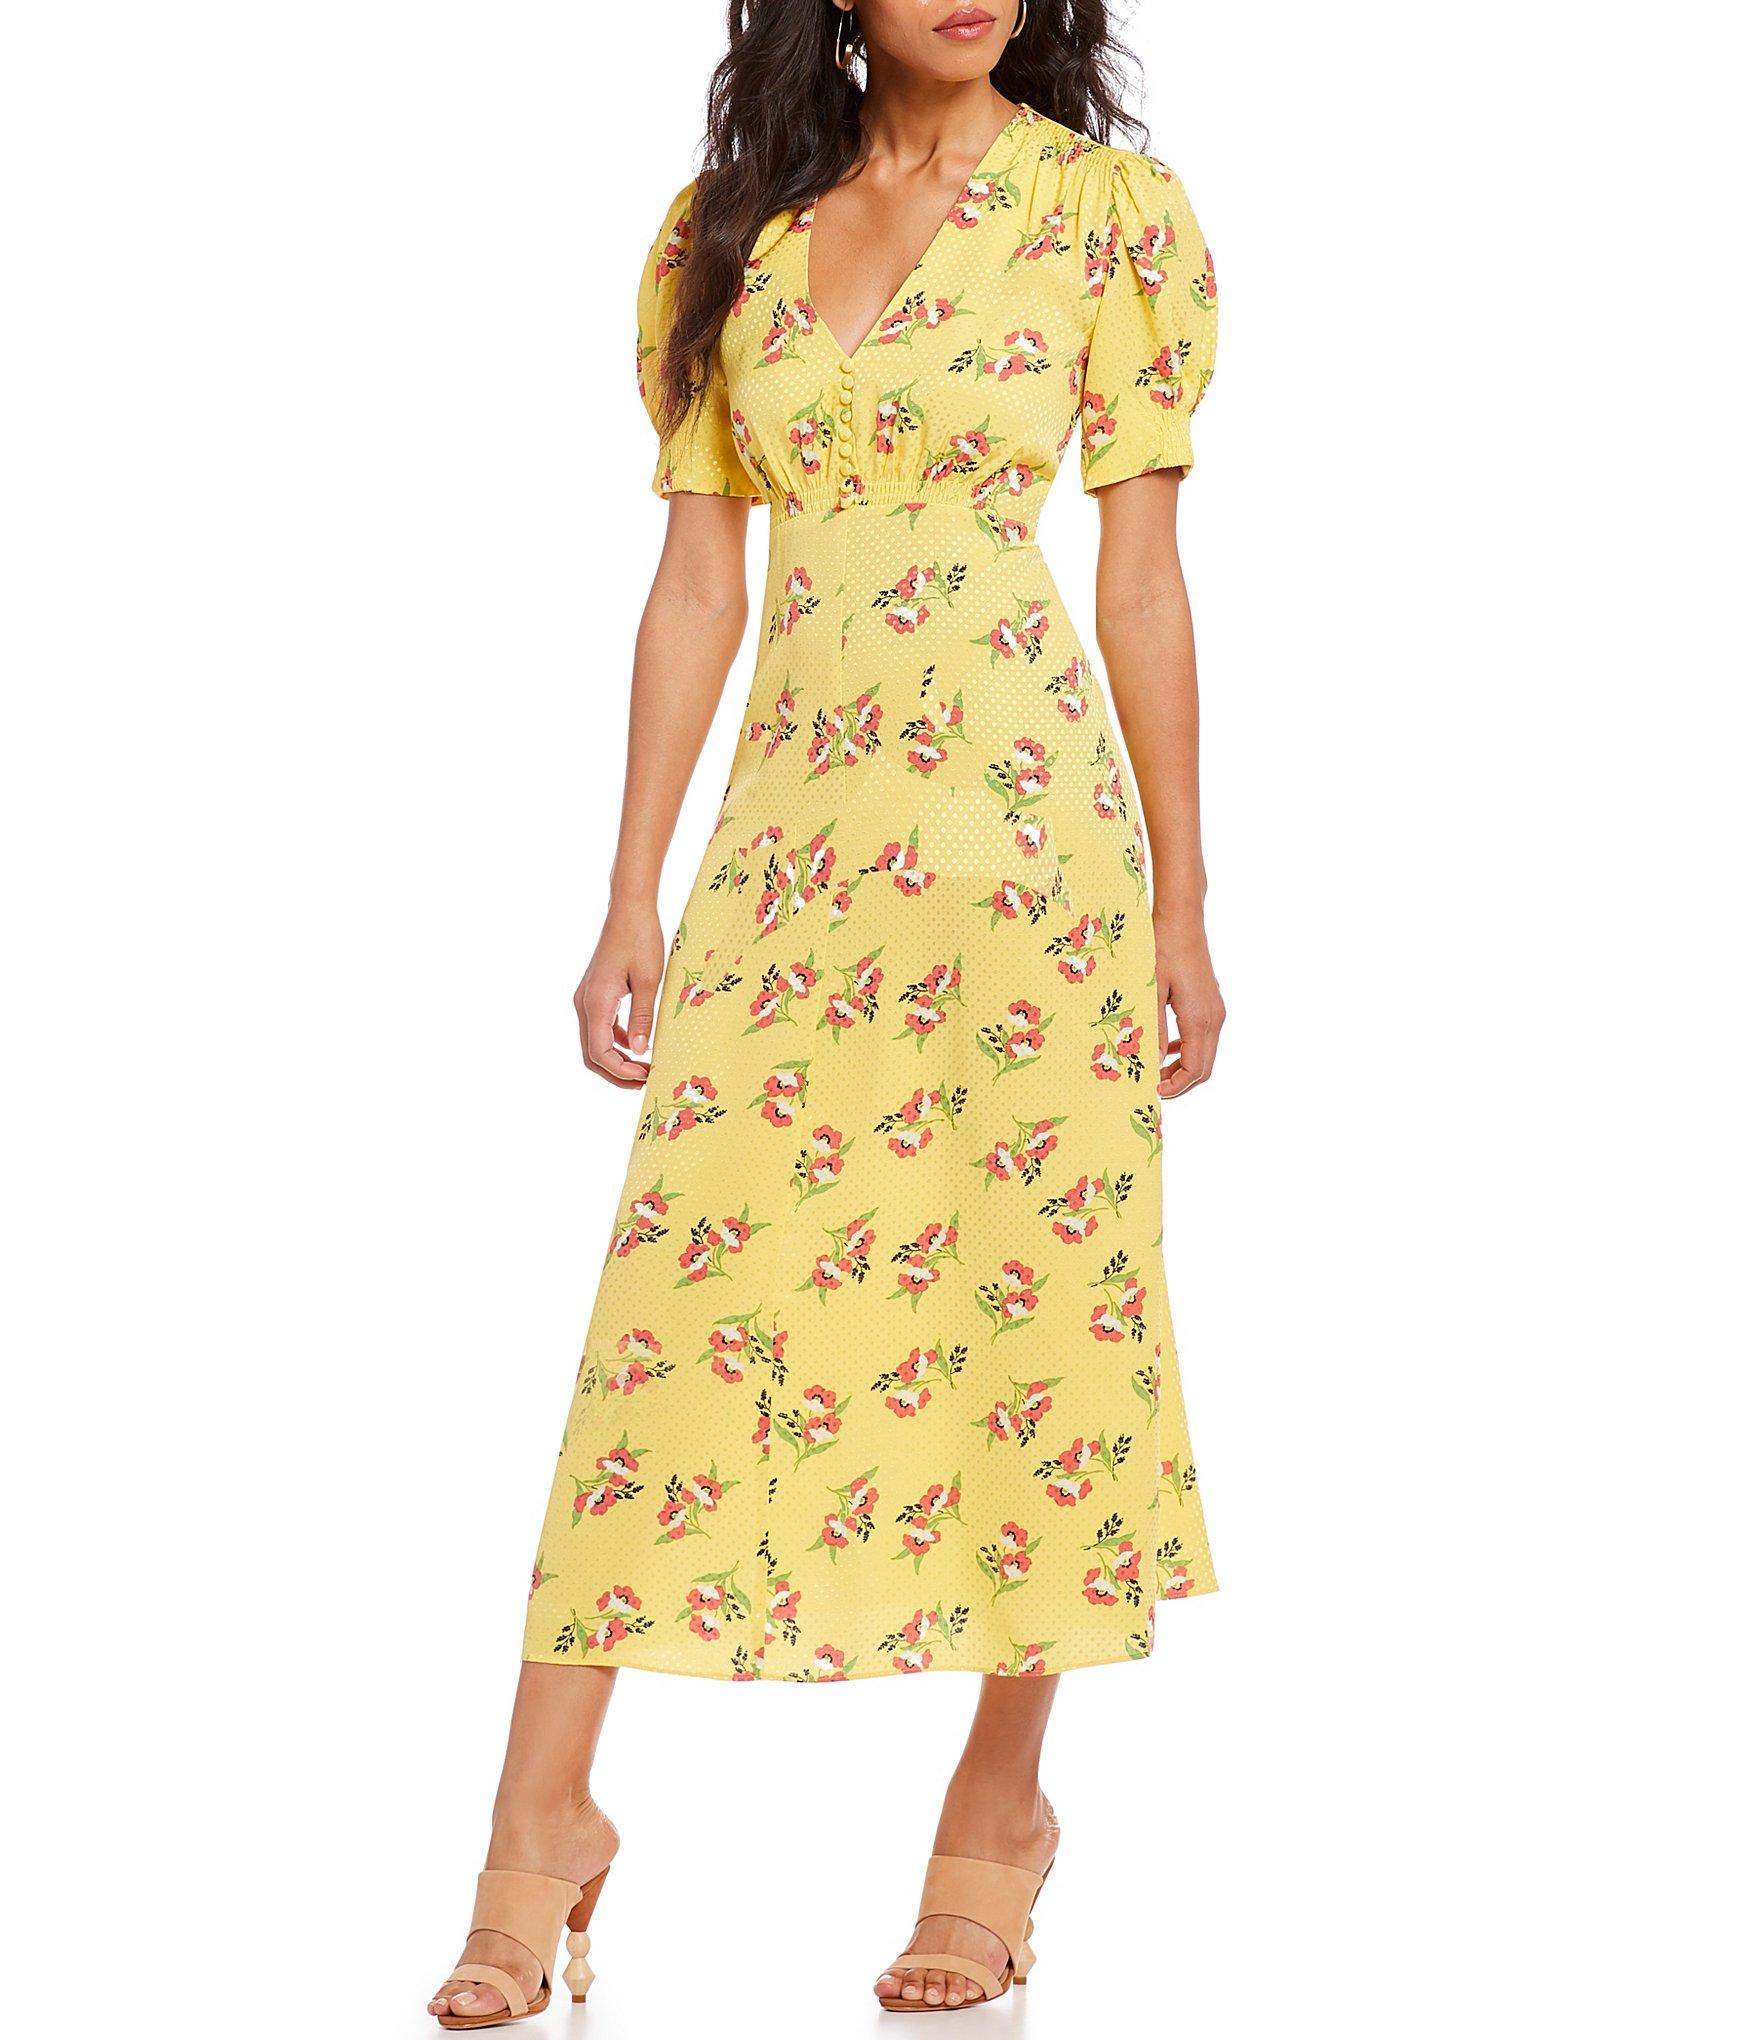 458e804c6e6 JILL Jill Stuart Floral Print V-neck Puffed Sleeve A-line Midi Dress ...